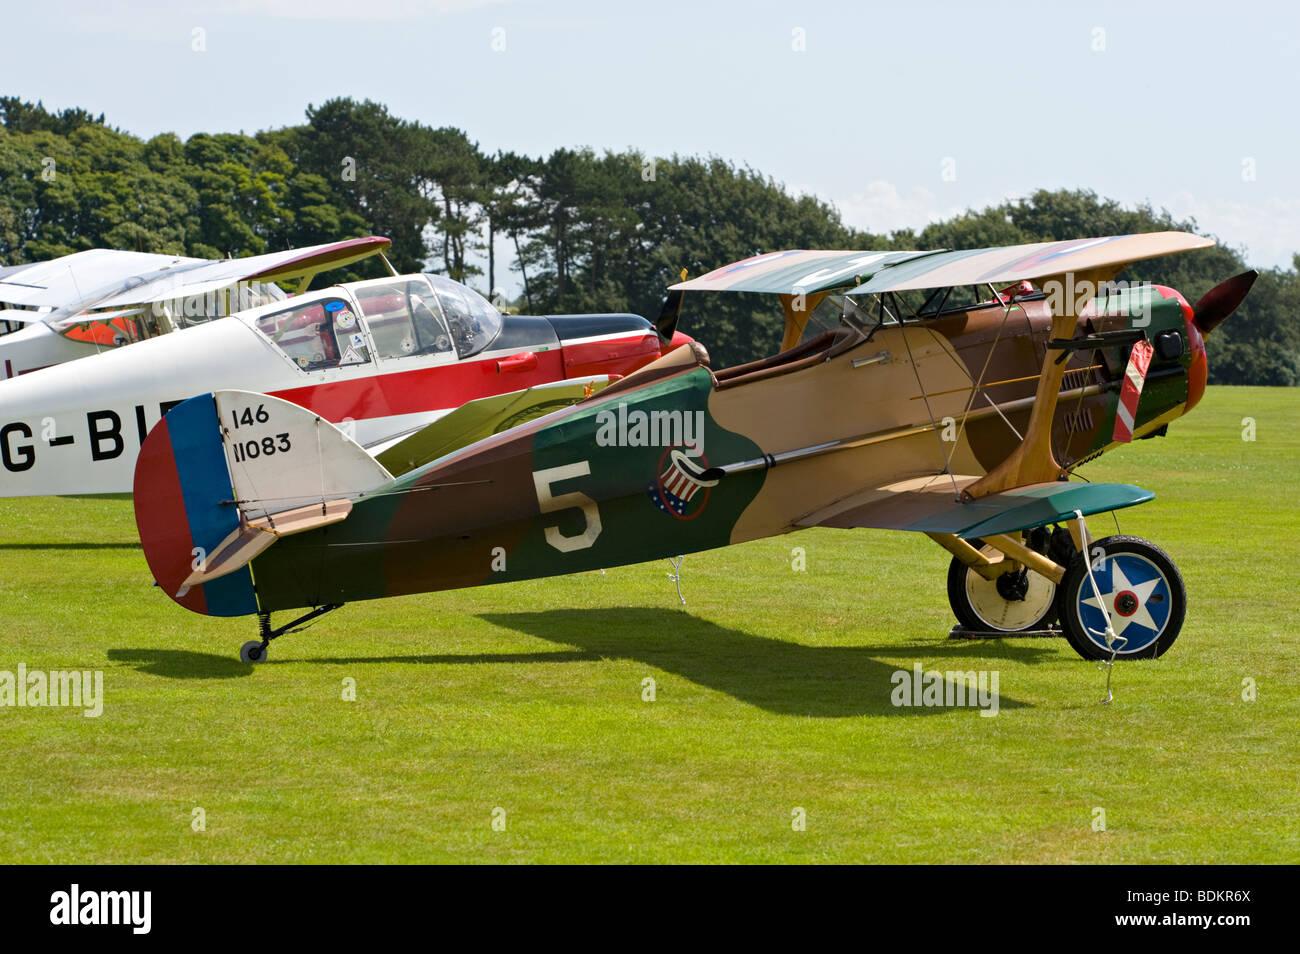 Vintage bi-plane at the Duke of York's Military School, Dover, Kent, UK. - Stock Image